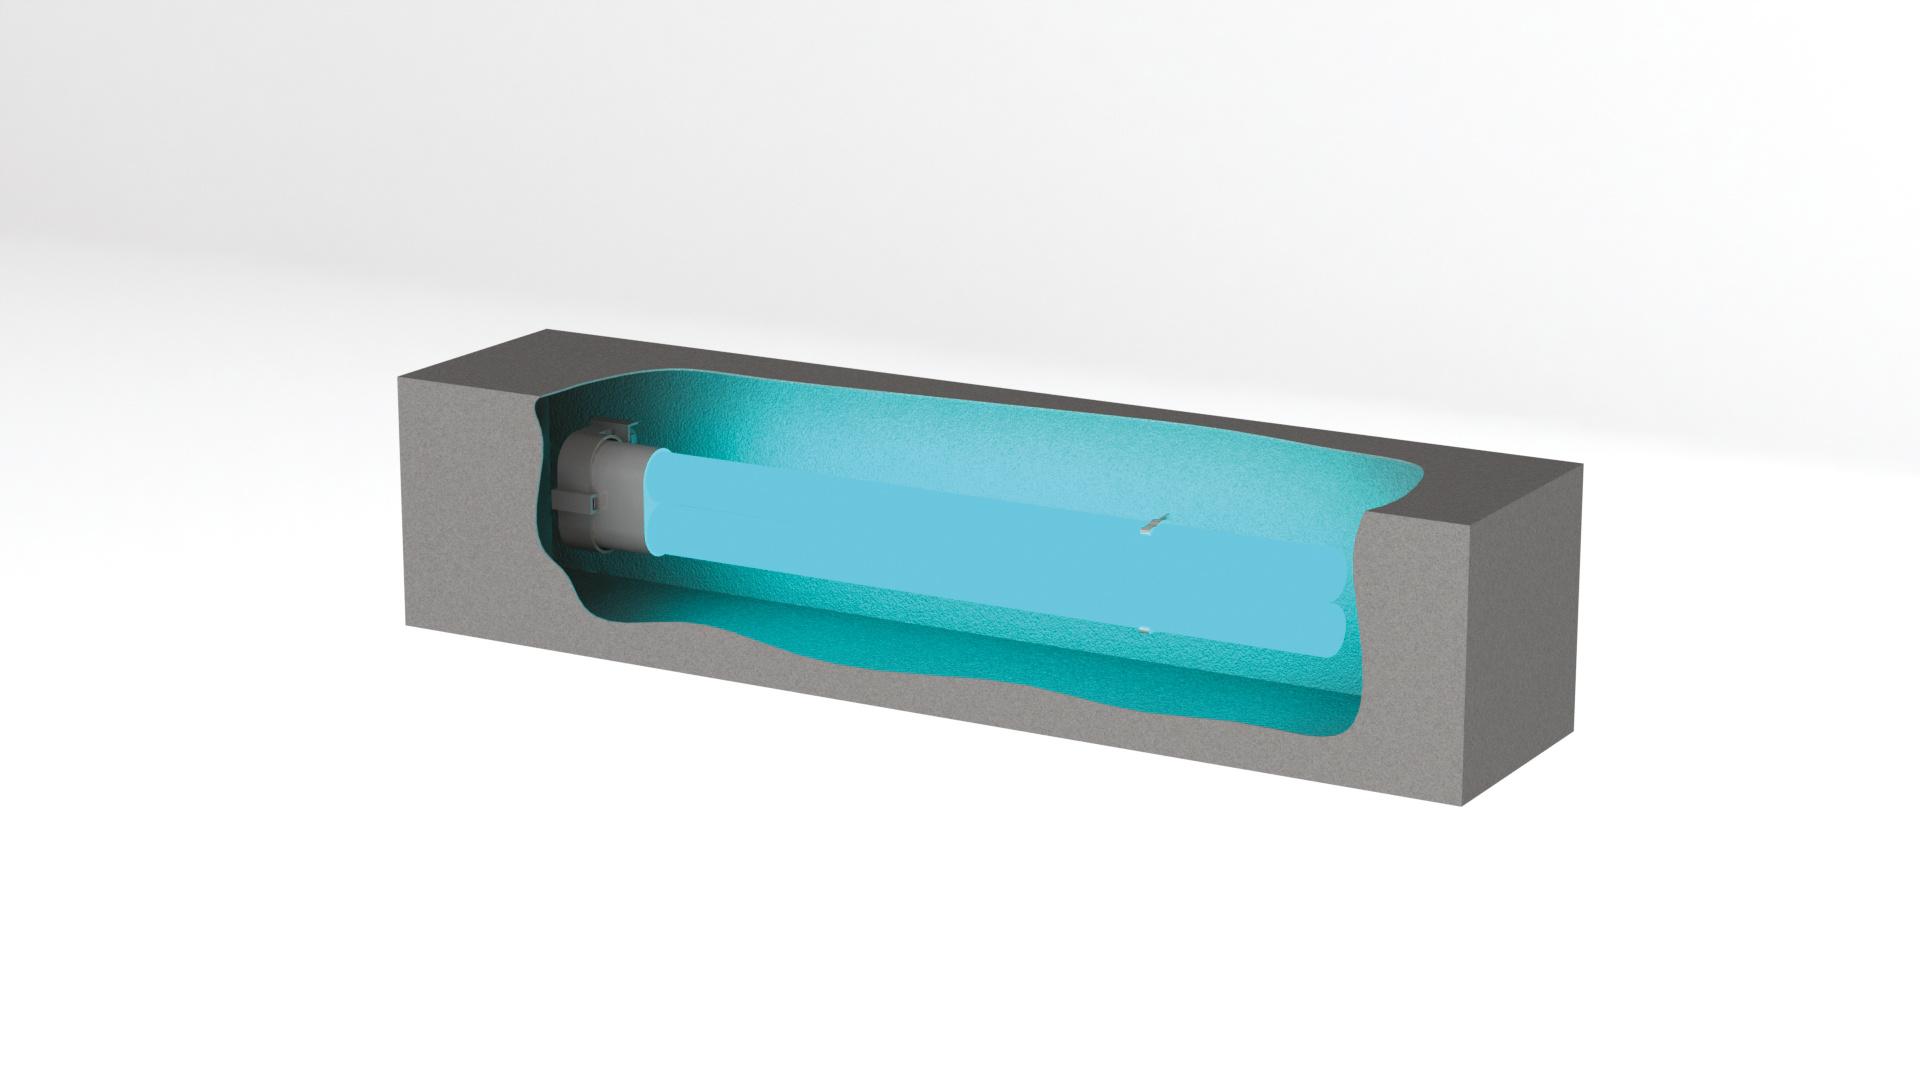 Beghelli Ersatzröhre SanificaAria30